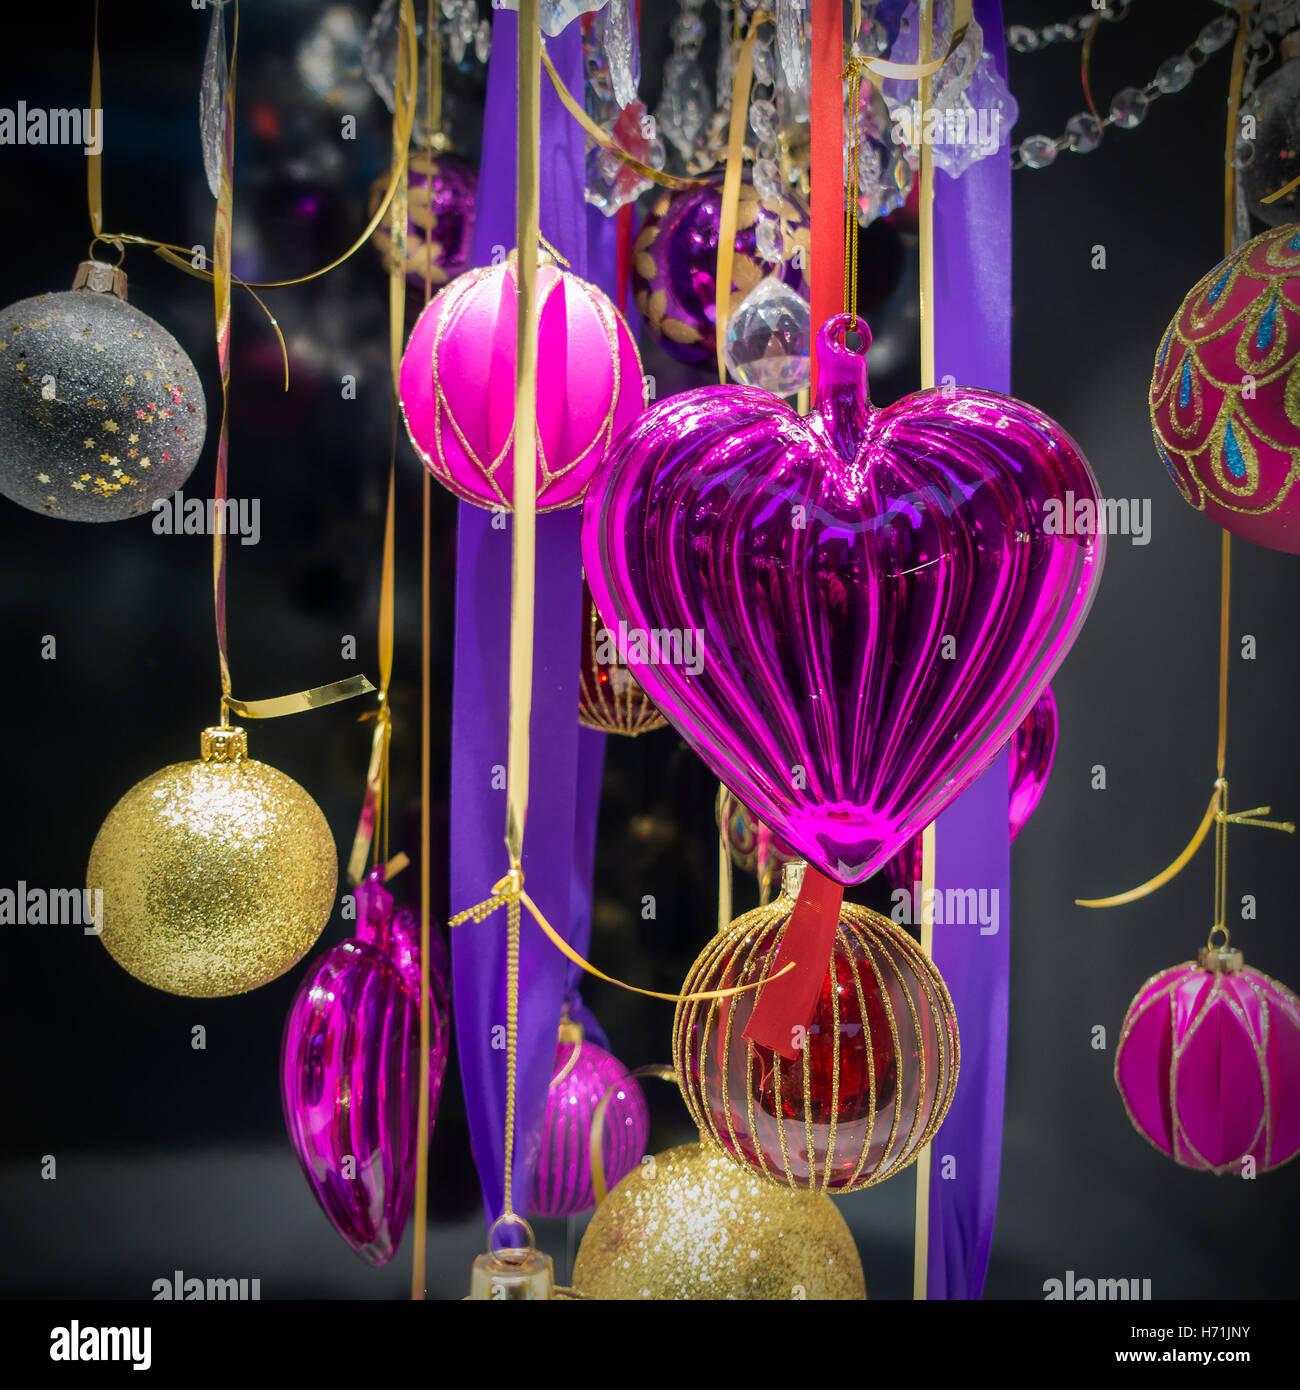 qualitativ hochwertige weihnachtskugeln stockfoto bild 124811847 alamy. Black Bedroom Furniture Sets. Home Design Ideas